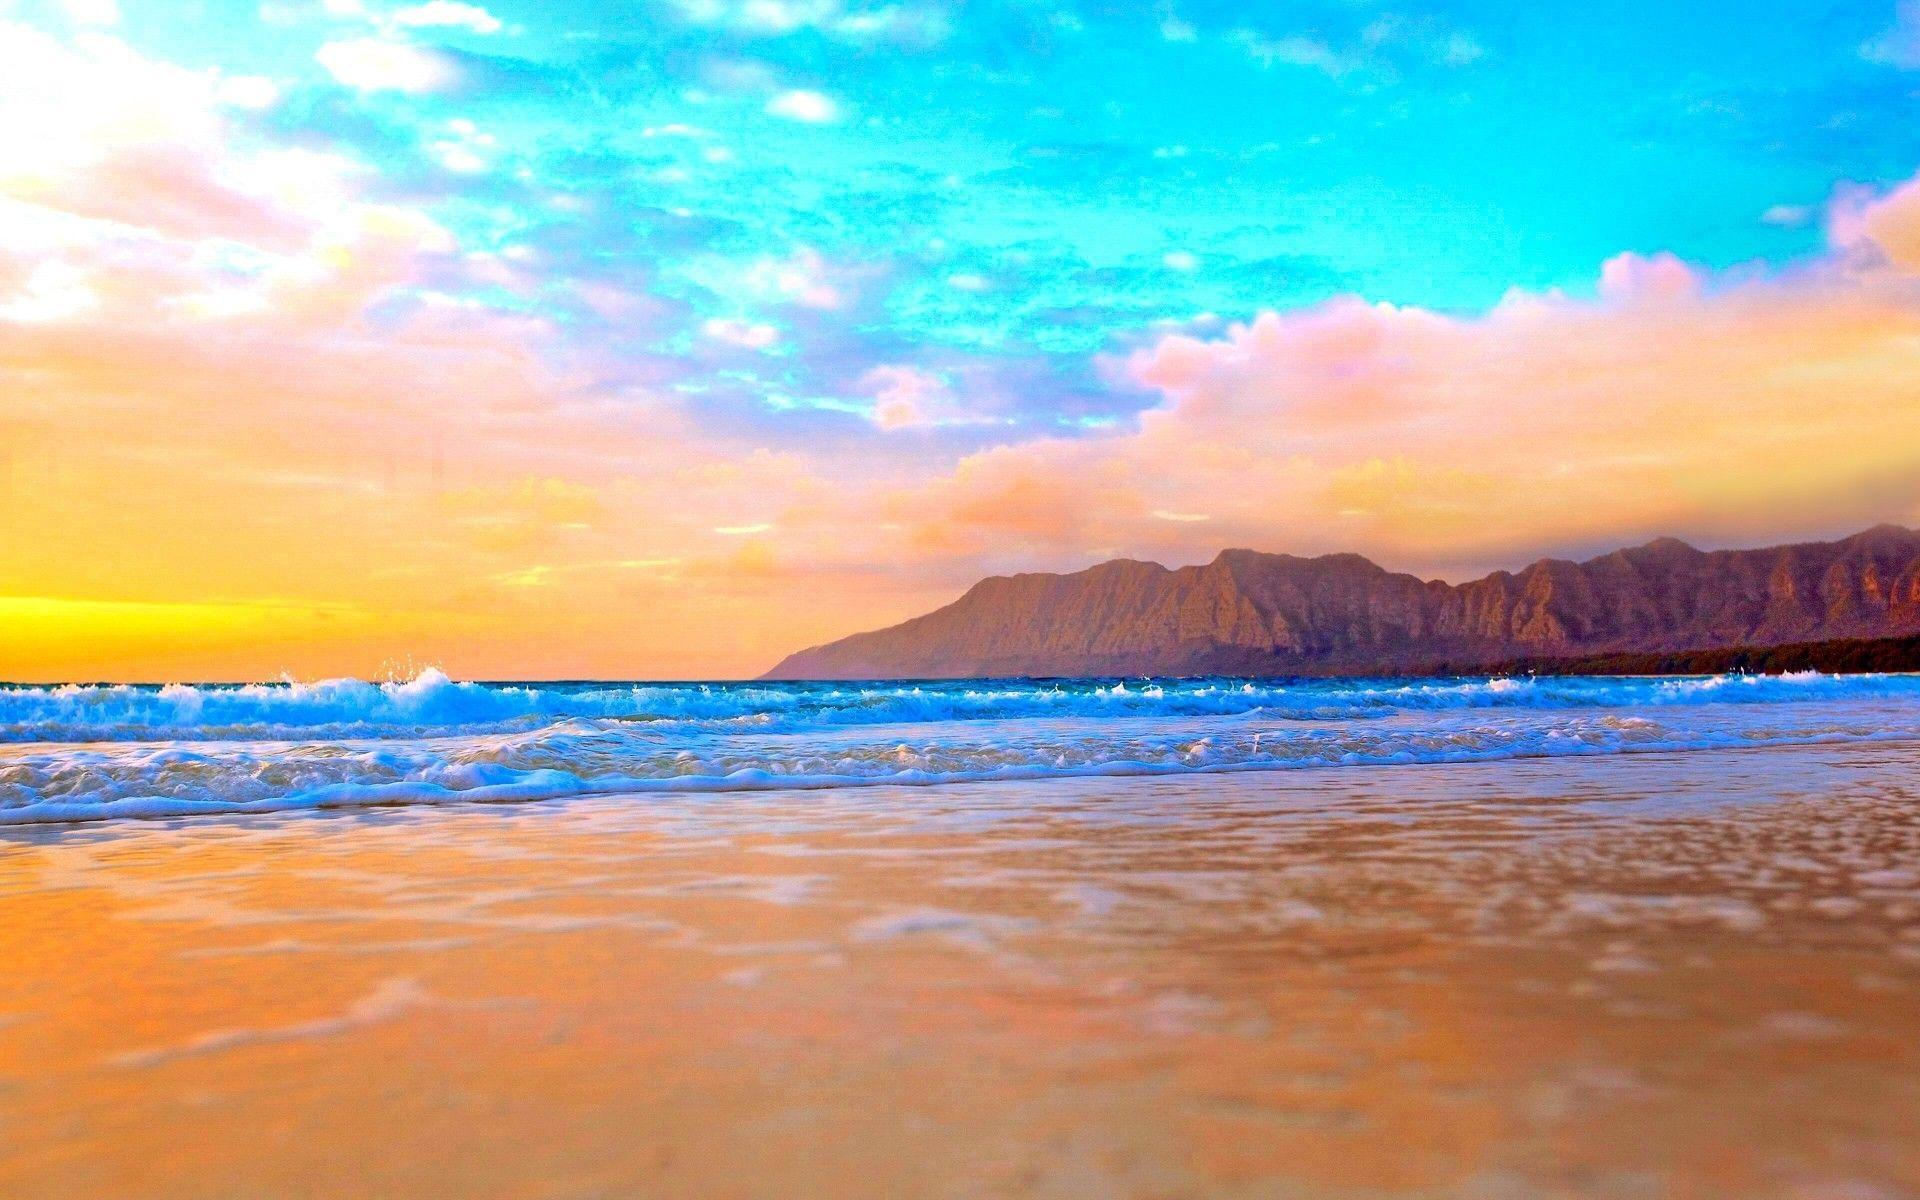 Calming Relaxing Wallpapers Top Free Calming Relaxing Backgrounds Wallpaperaccess